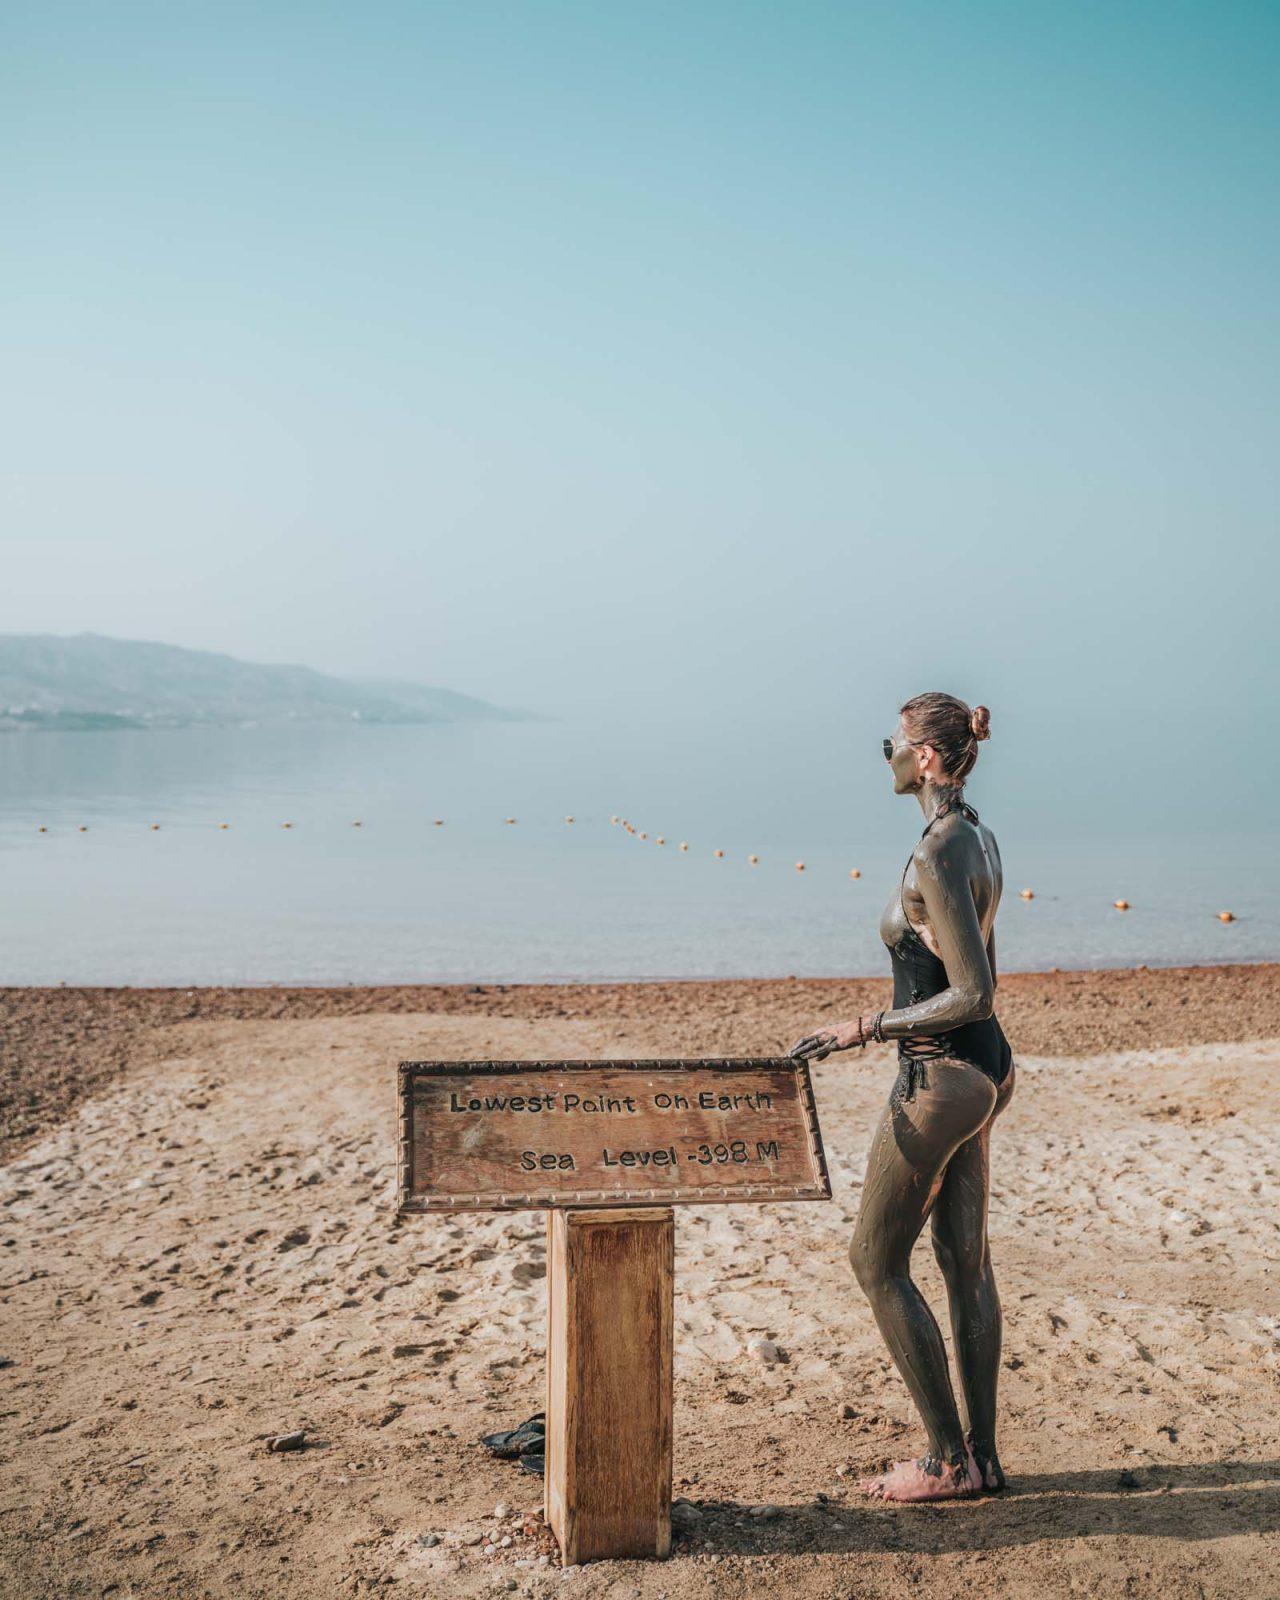 Jordan tour: Oksana about to take a dip in the Dead Sea